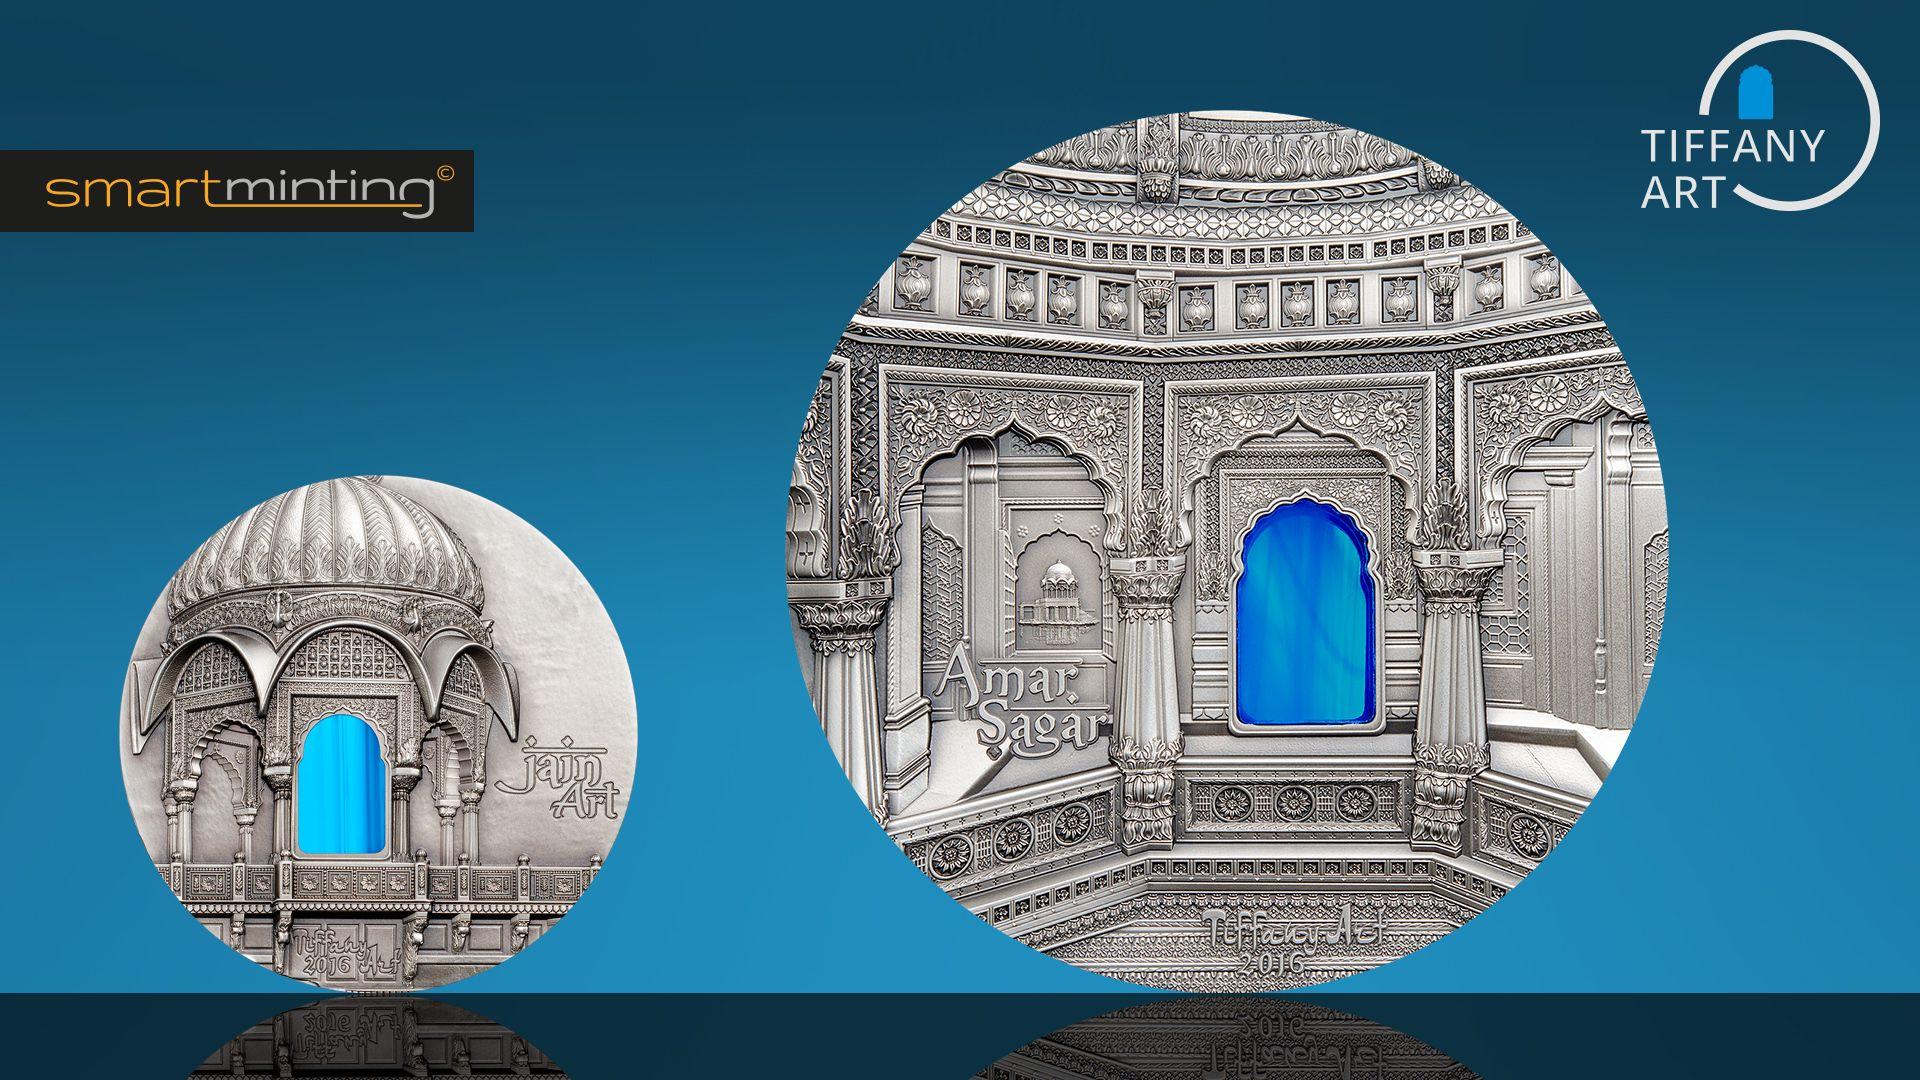 2016 Tiffany Art Jain Art 2oz & Amar Sagar 1 Kilo Silver Coins